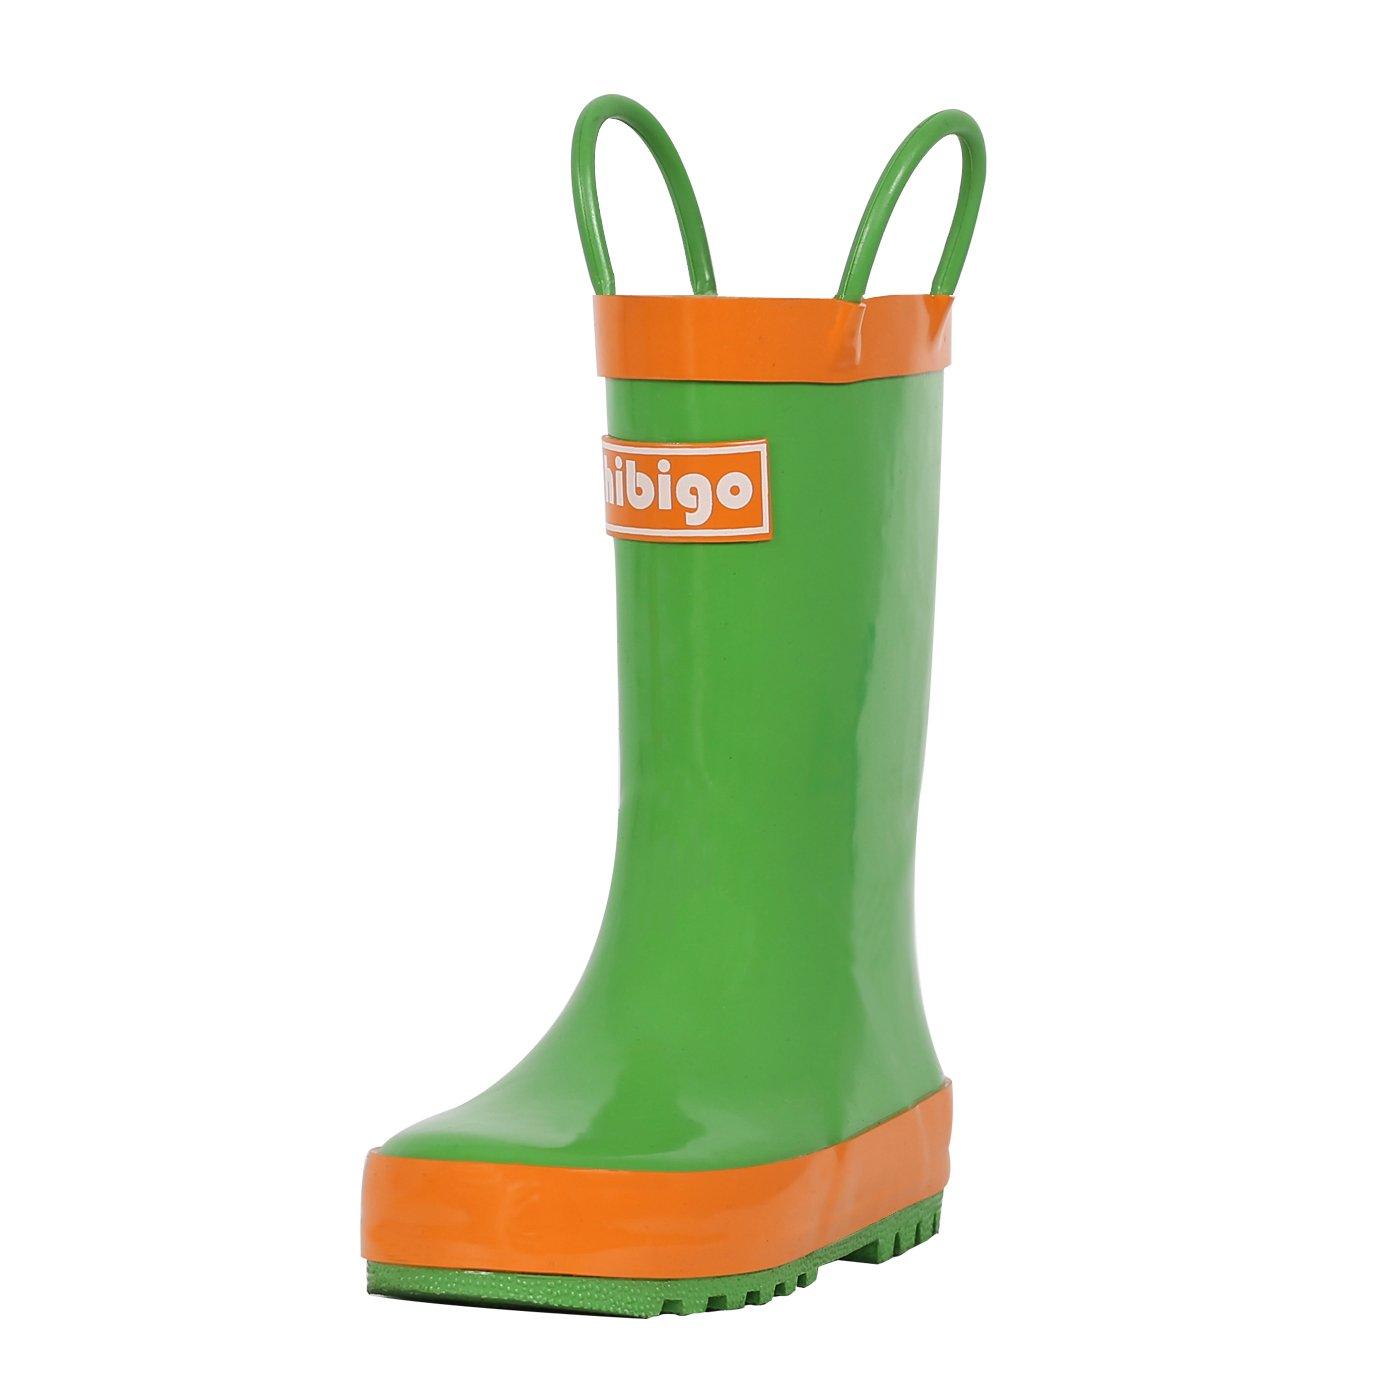 hibigo Children's Natural Rubber Rain Boots with Handles Easy for Little Kids & Toddler Boys Girls, Green Mix Orange